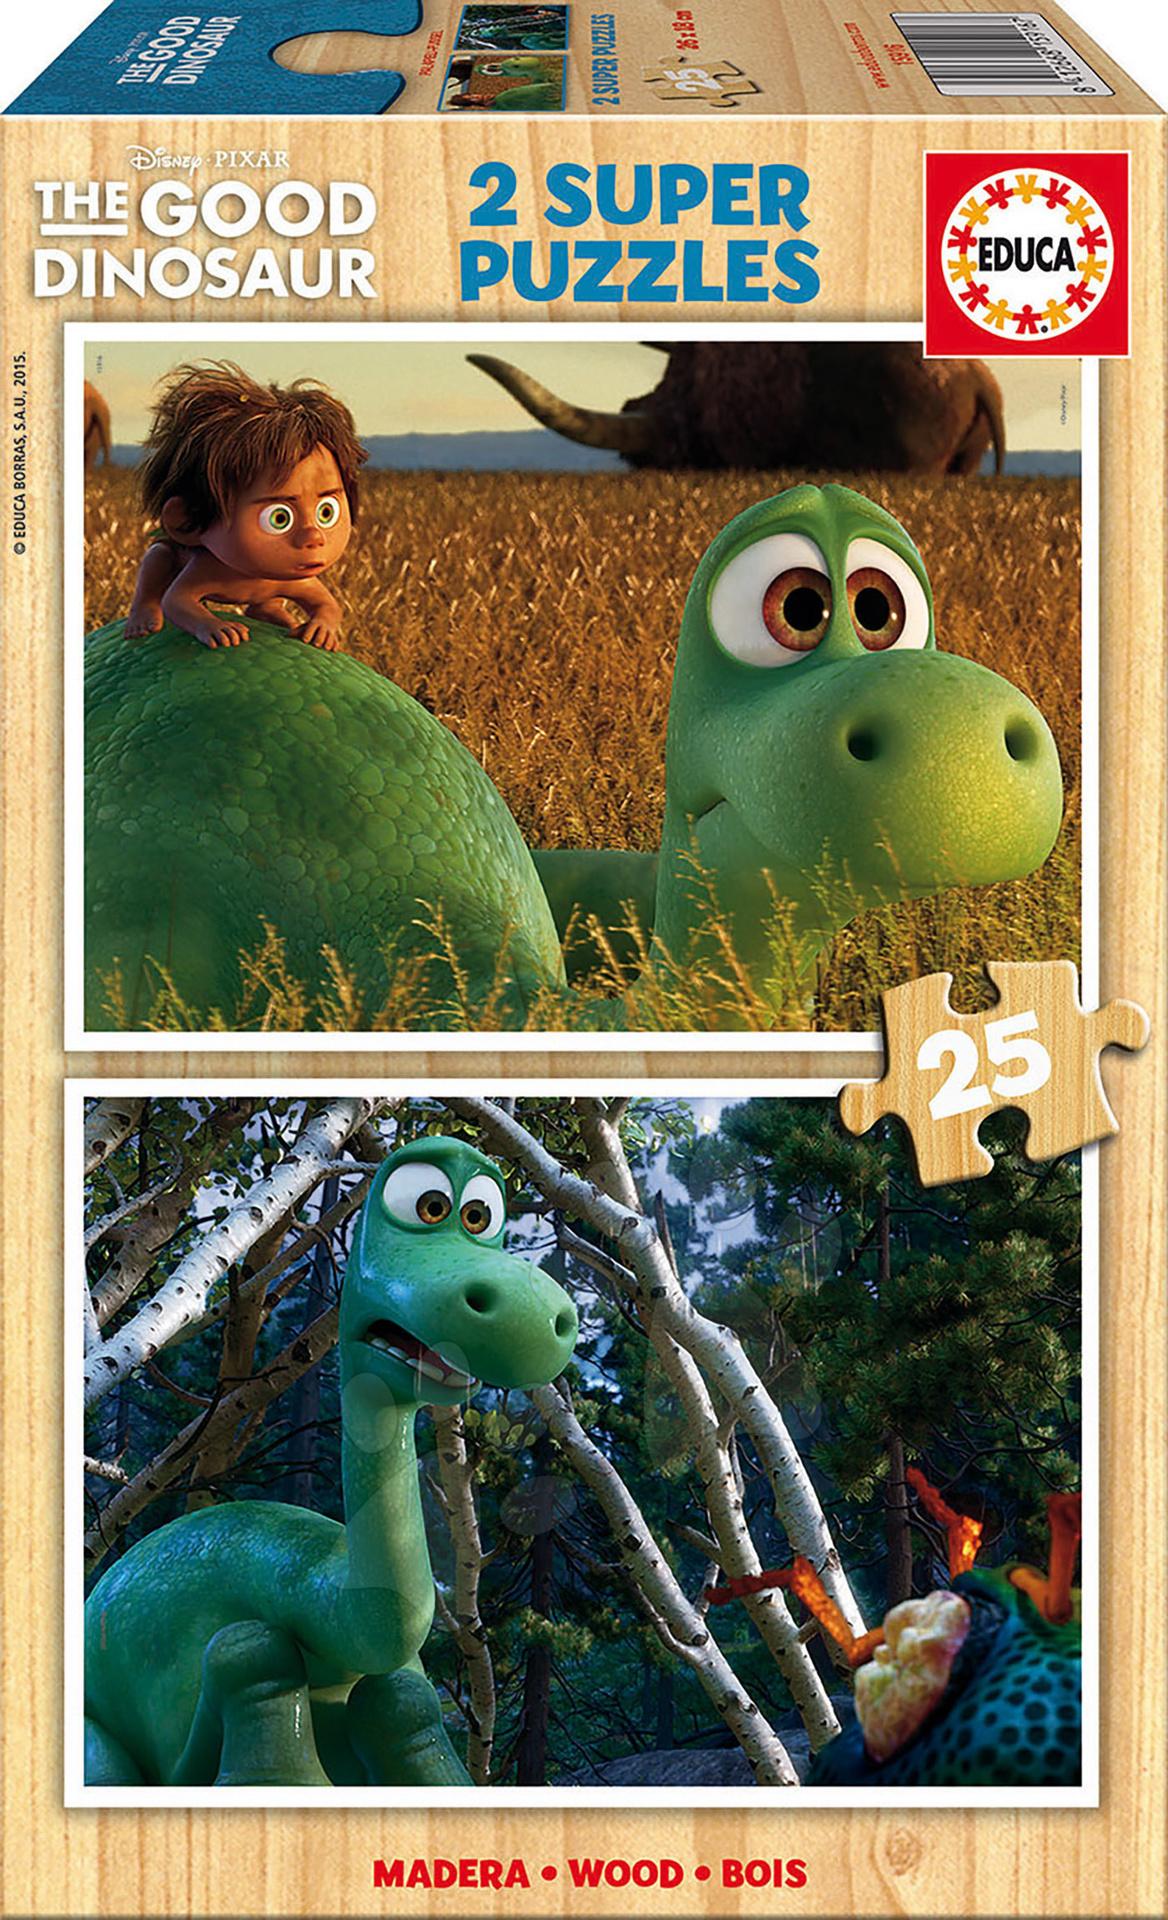 Drevené Disney puzzle - Drevené puzzle Dobrý dinosaurus Educa 2x 25 dielov